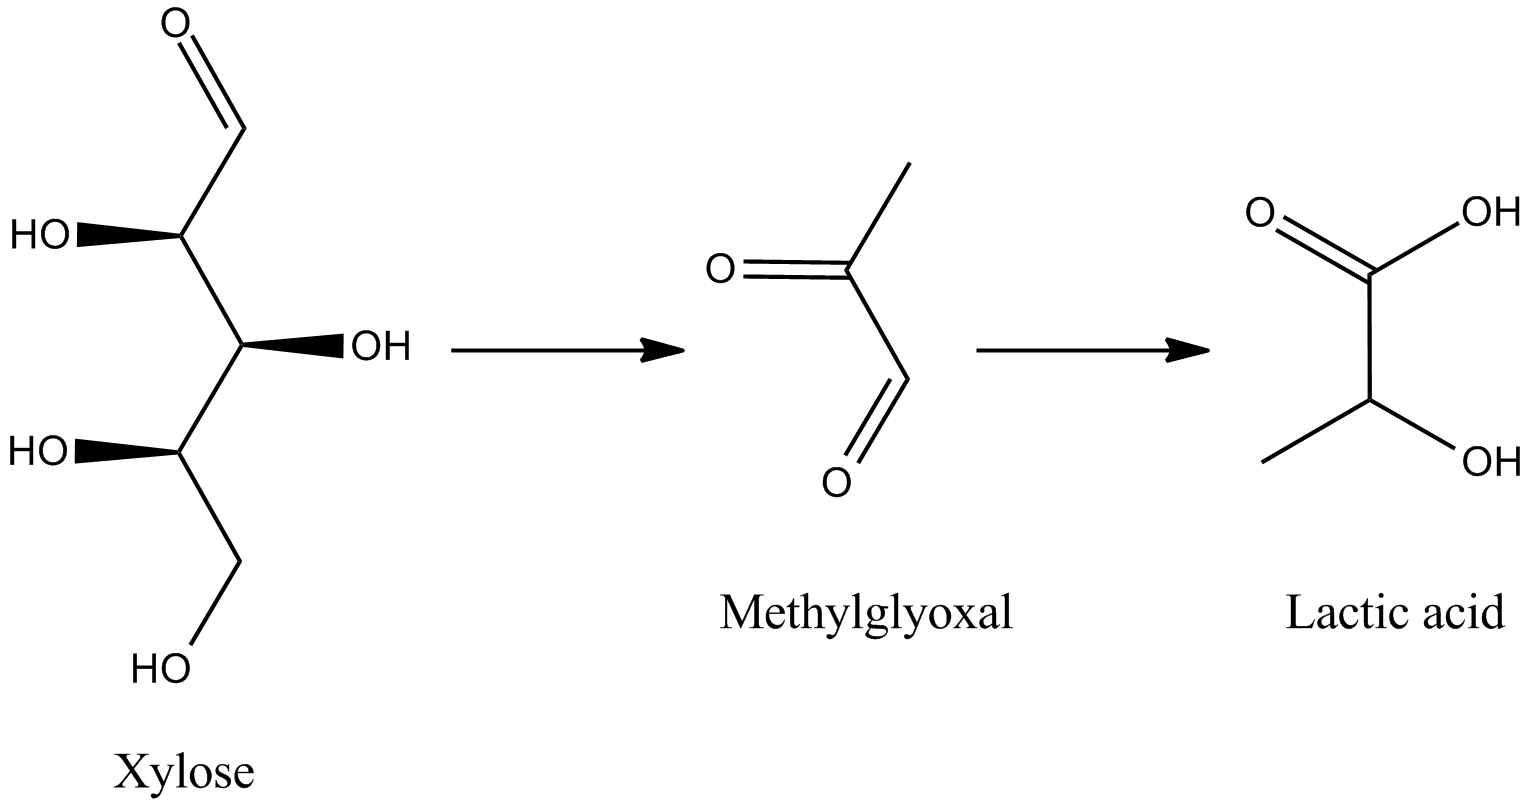 Crystallisation diagram google search chemistry pinterest crystallisation diagram google search chemistry pinterest chemistry ccuart Images